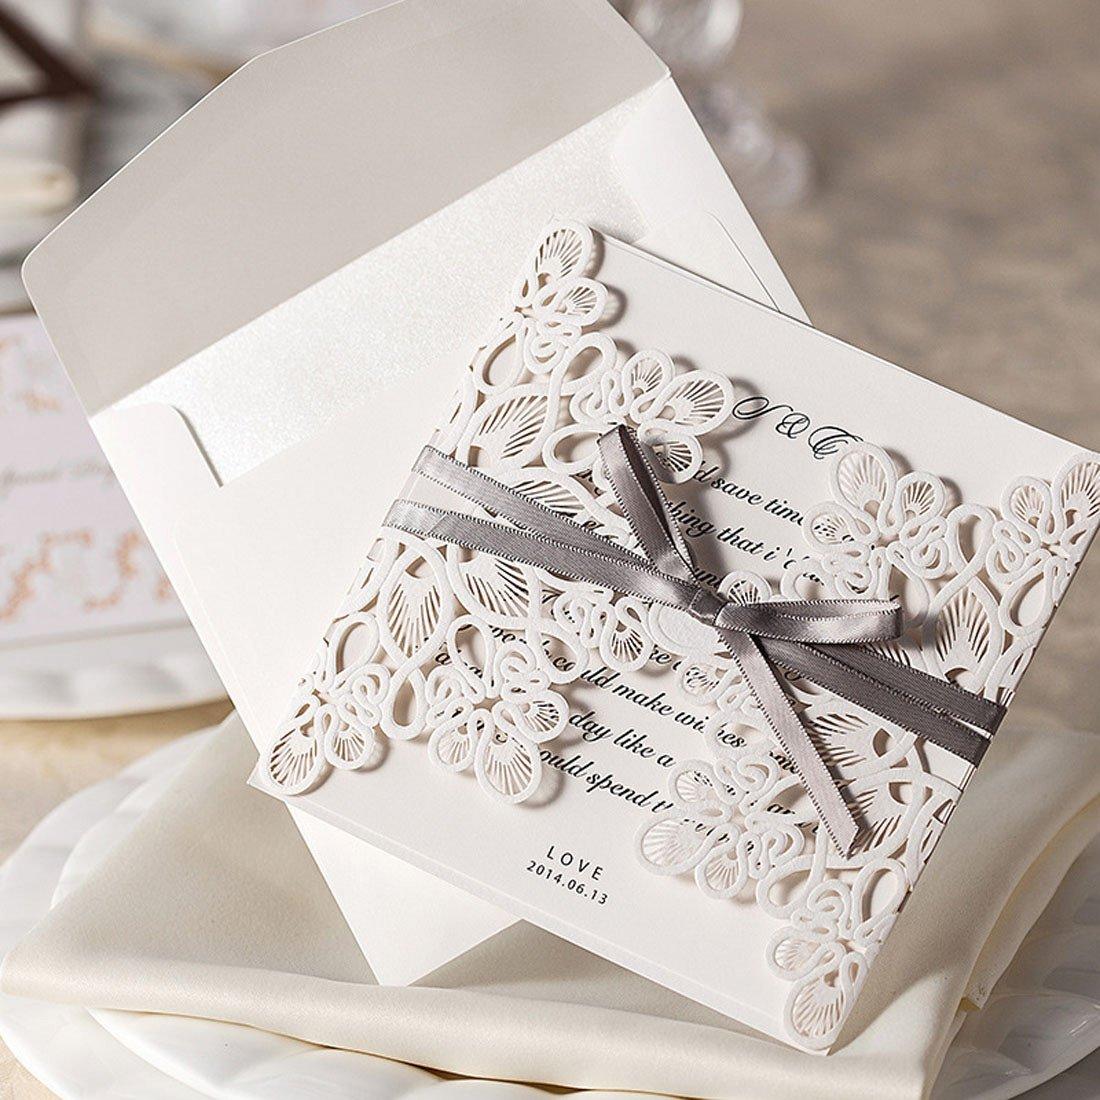 Brides Wedding Invitation Kit: WISHMADE 50 Count Luxury Elegant Laser Cut Invitations